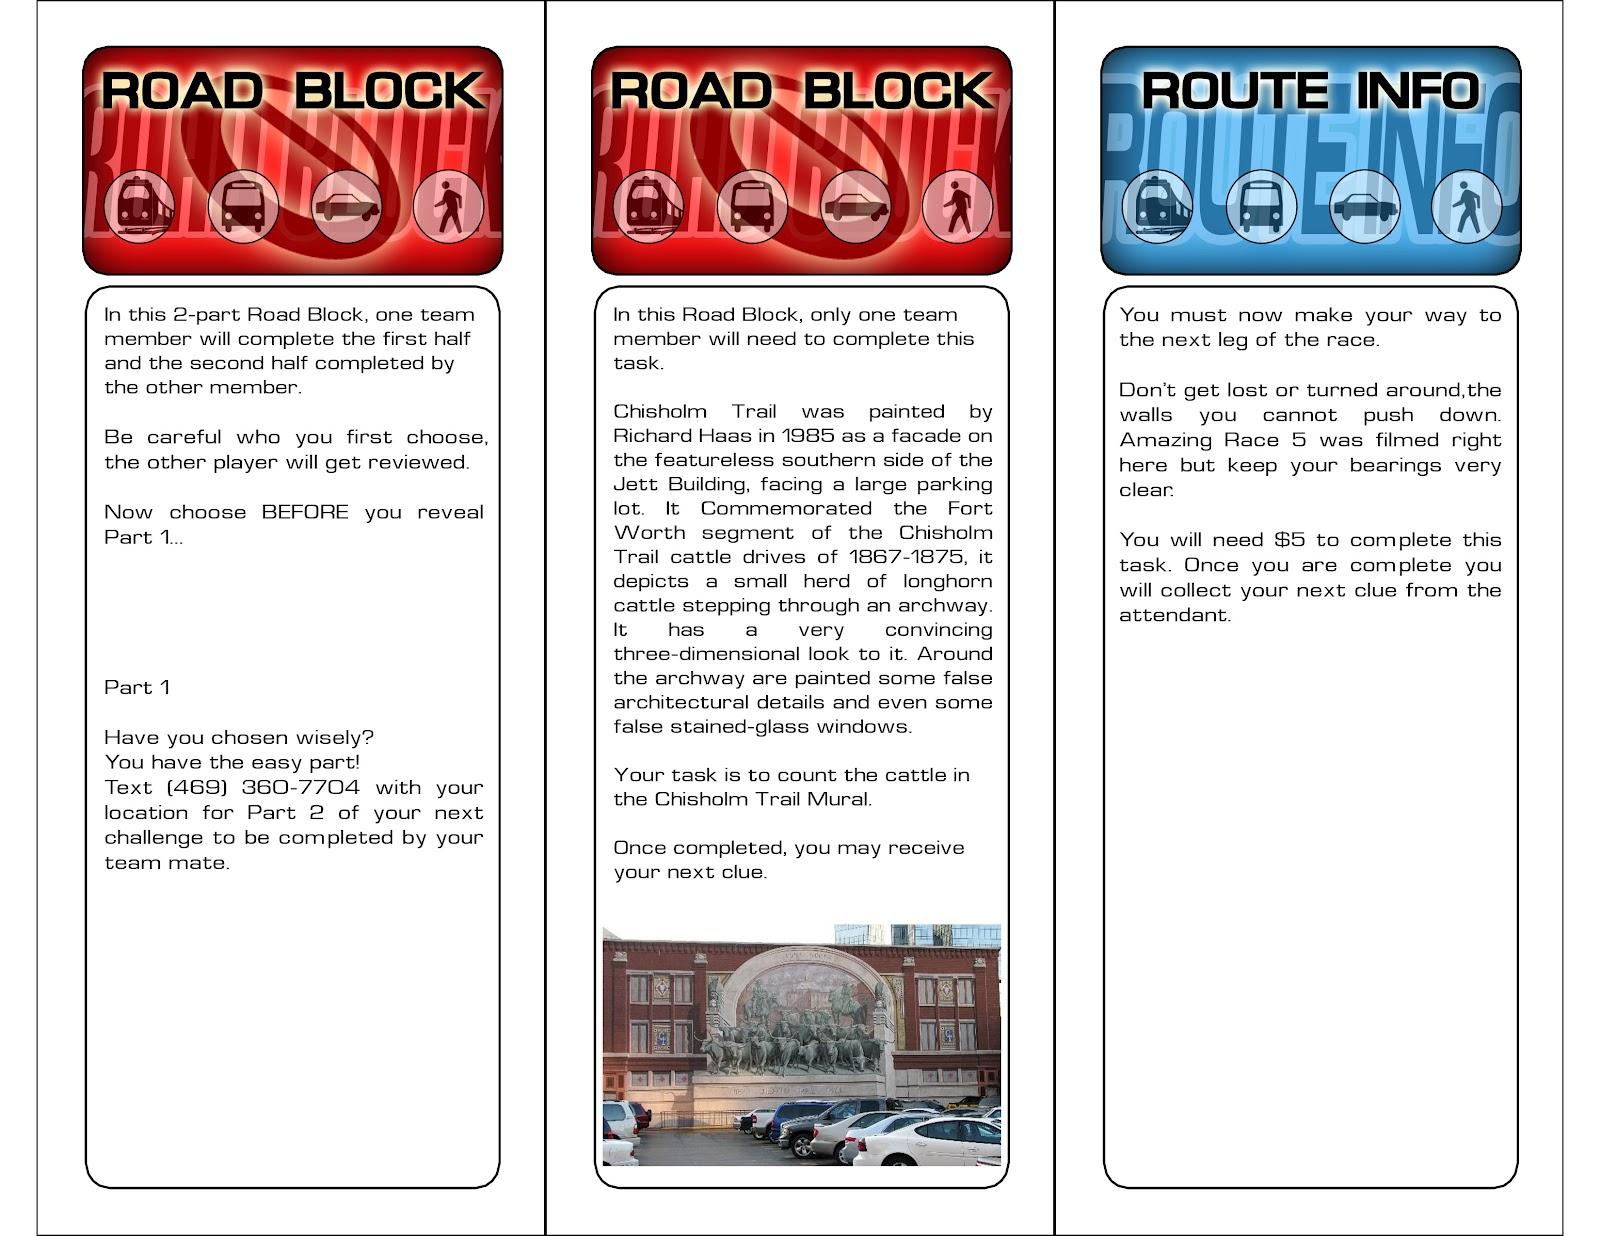 Amazing race ideas - Trinity Baptist Amazing Race Ft Worth Edition 2012